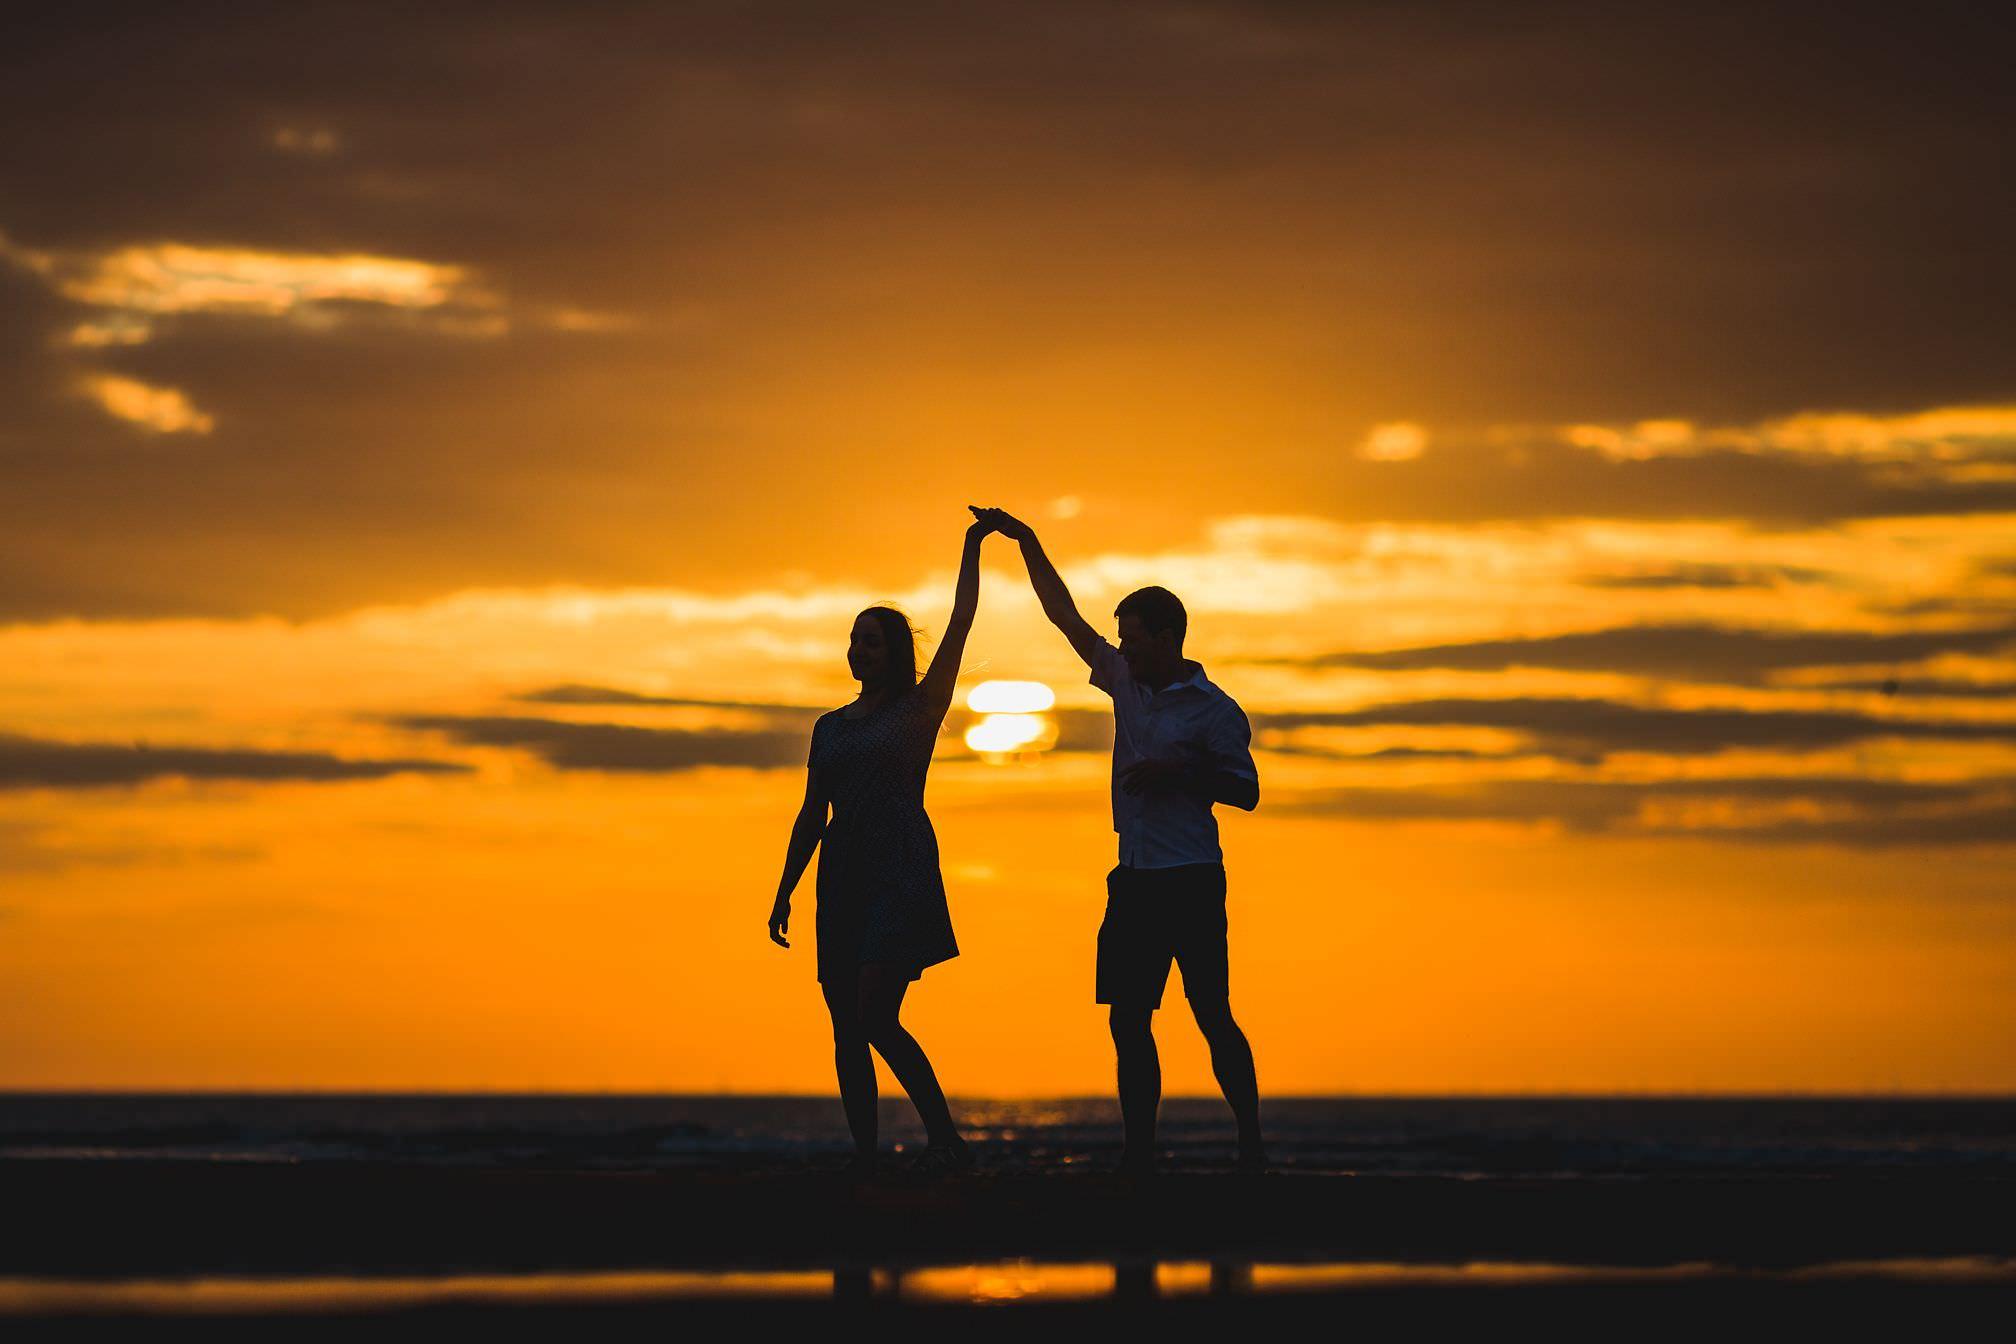 Wells-next-the-Sea Sunset